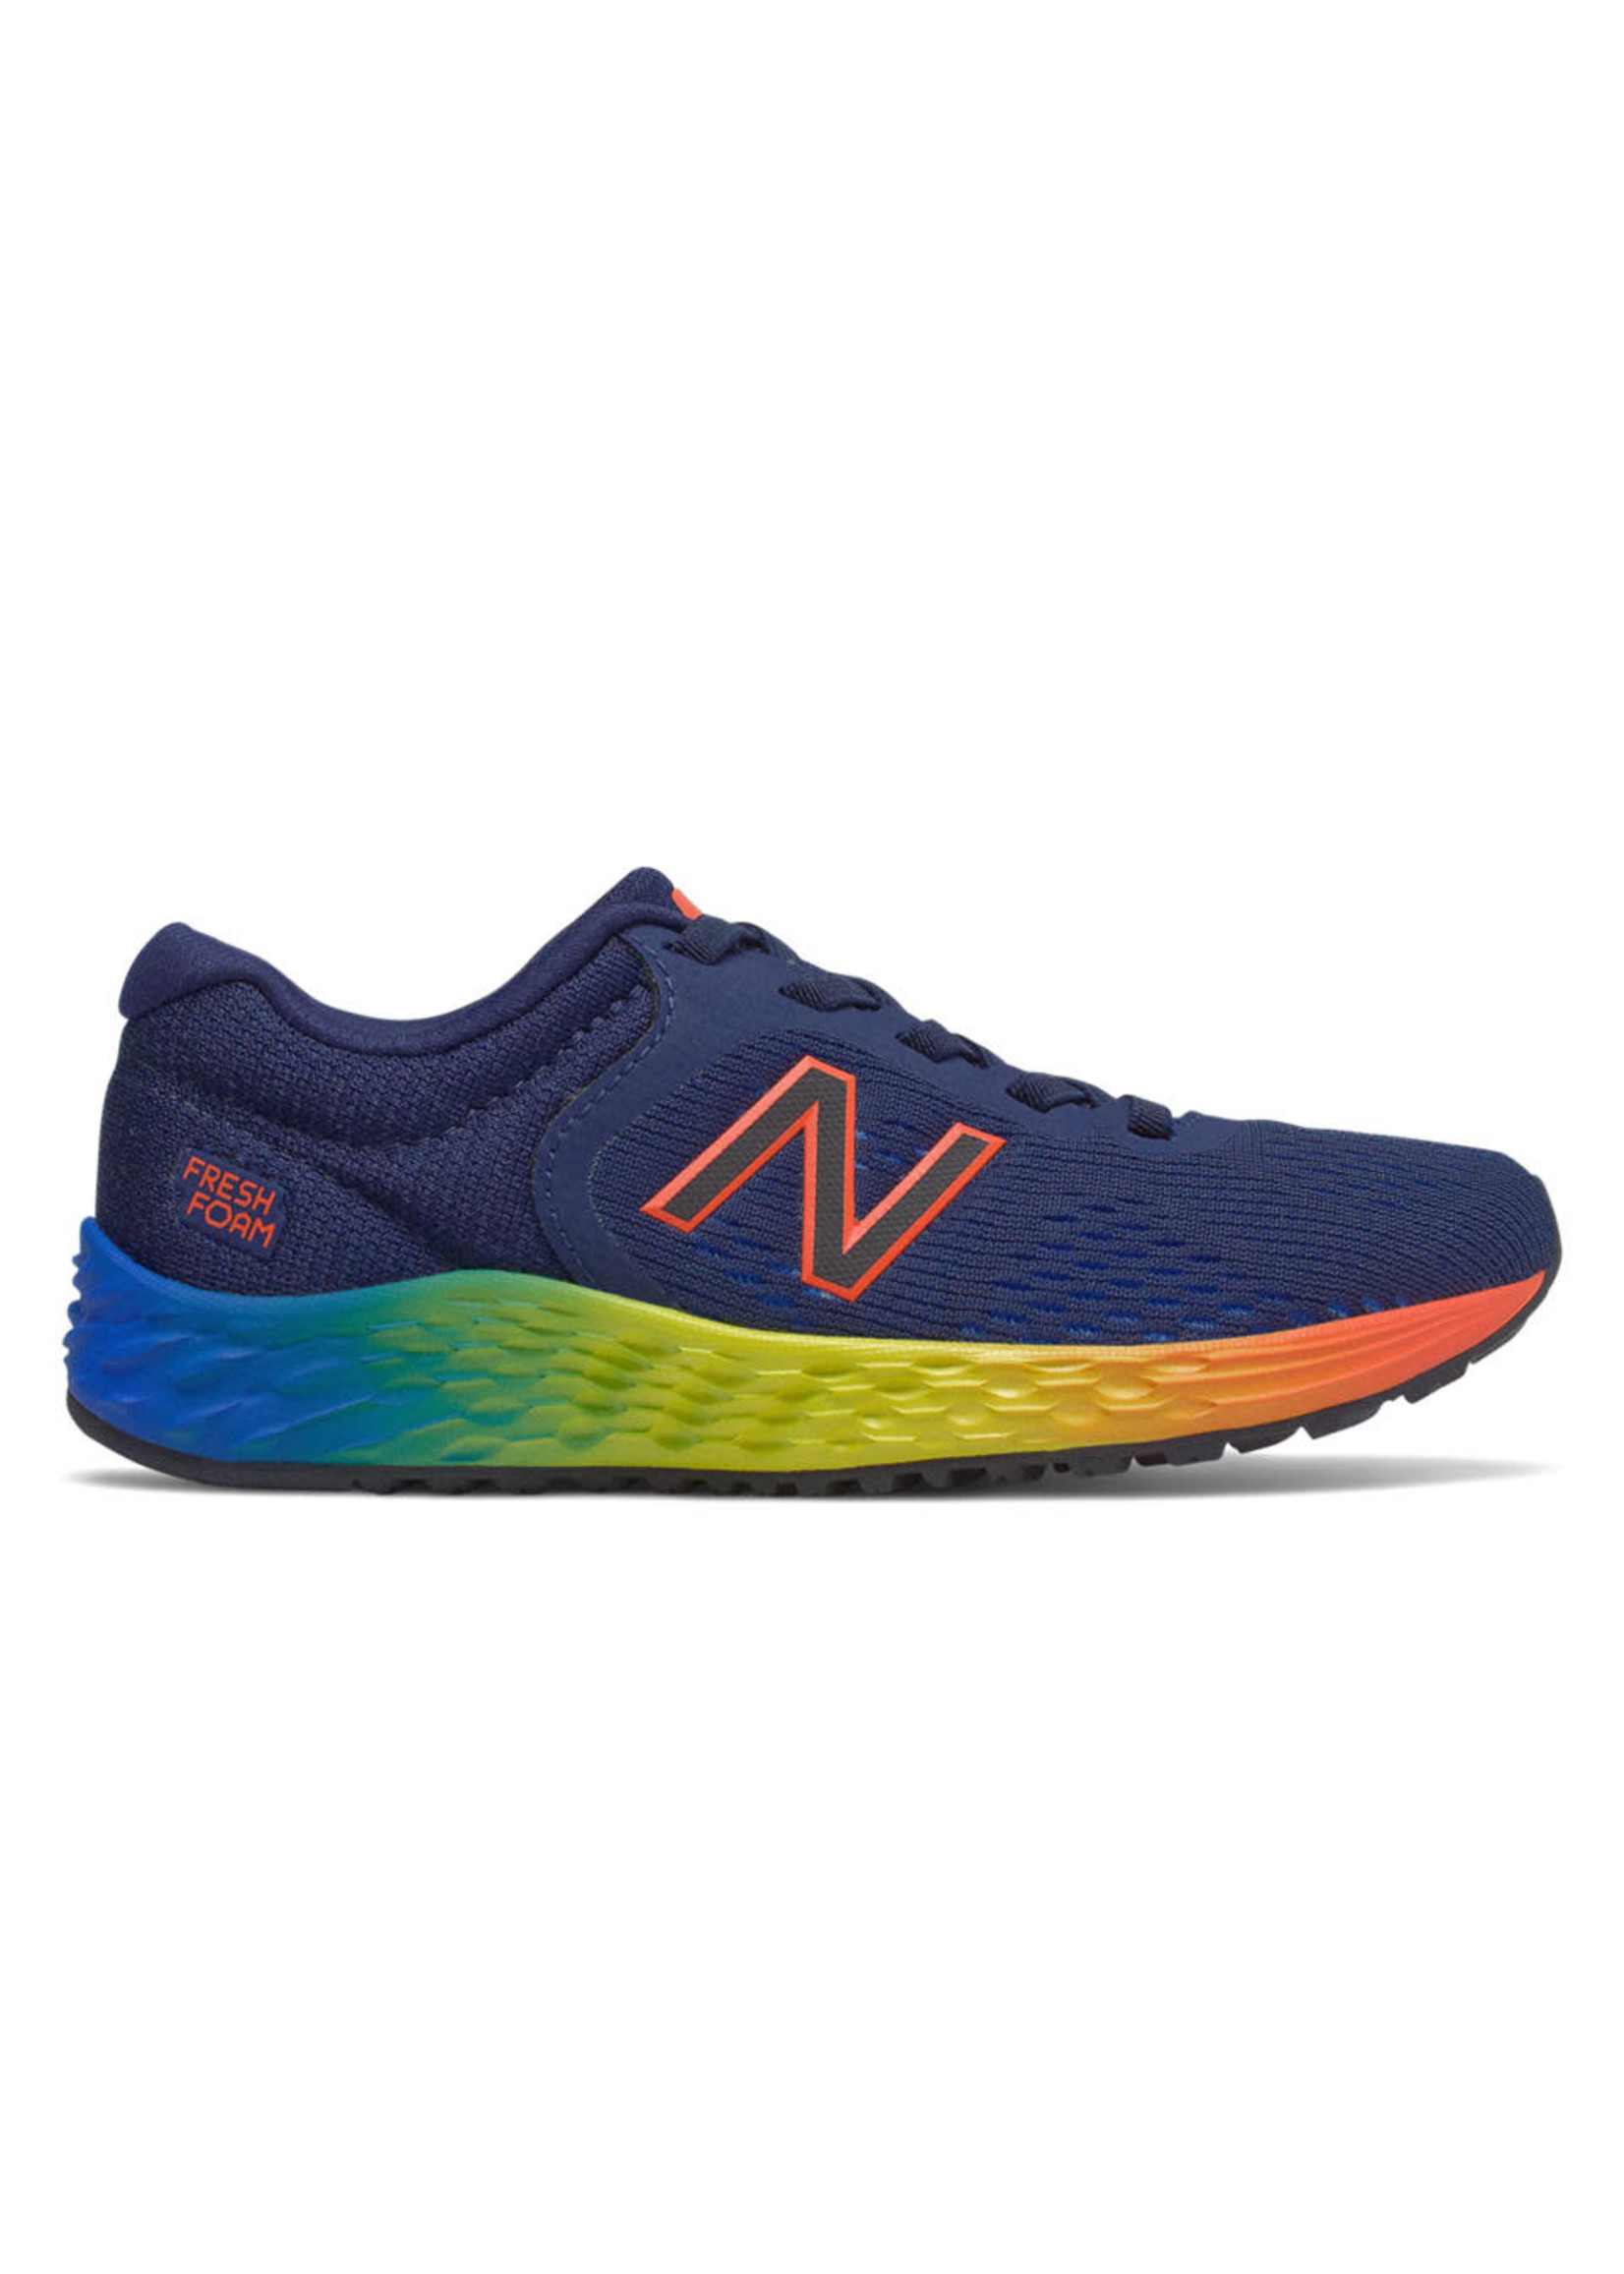 new balance New Balance Arishi V2 Junior Running Shoe - Navy/Yellow/Orange